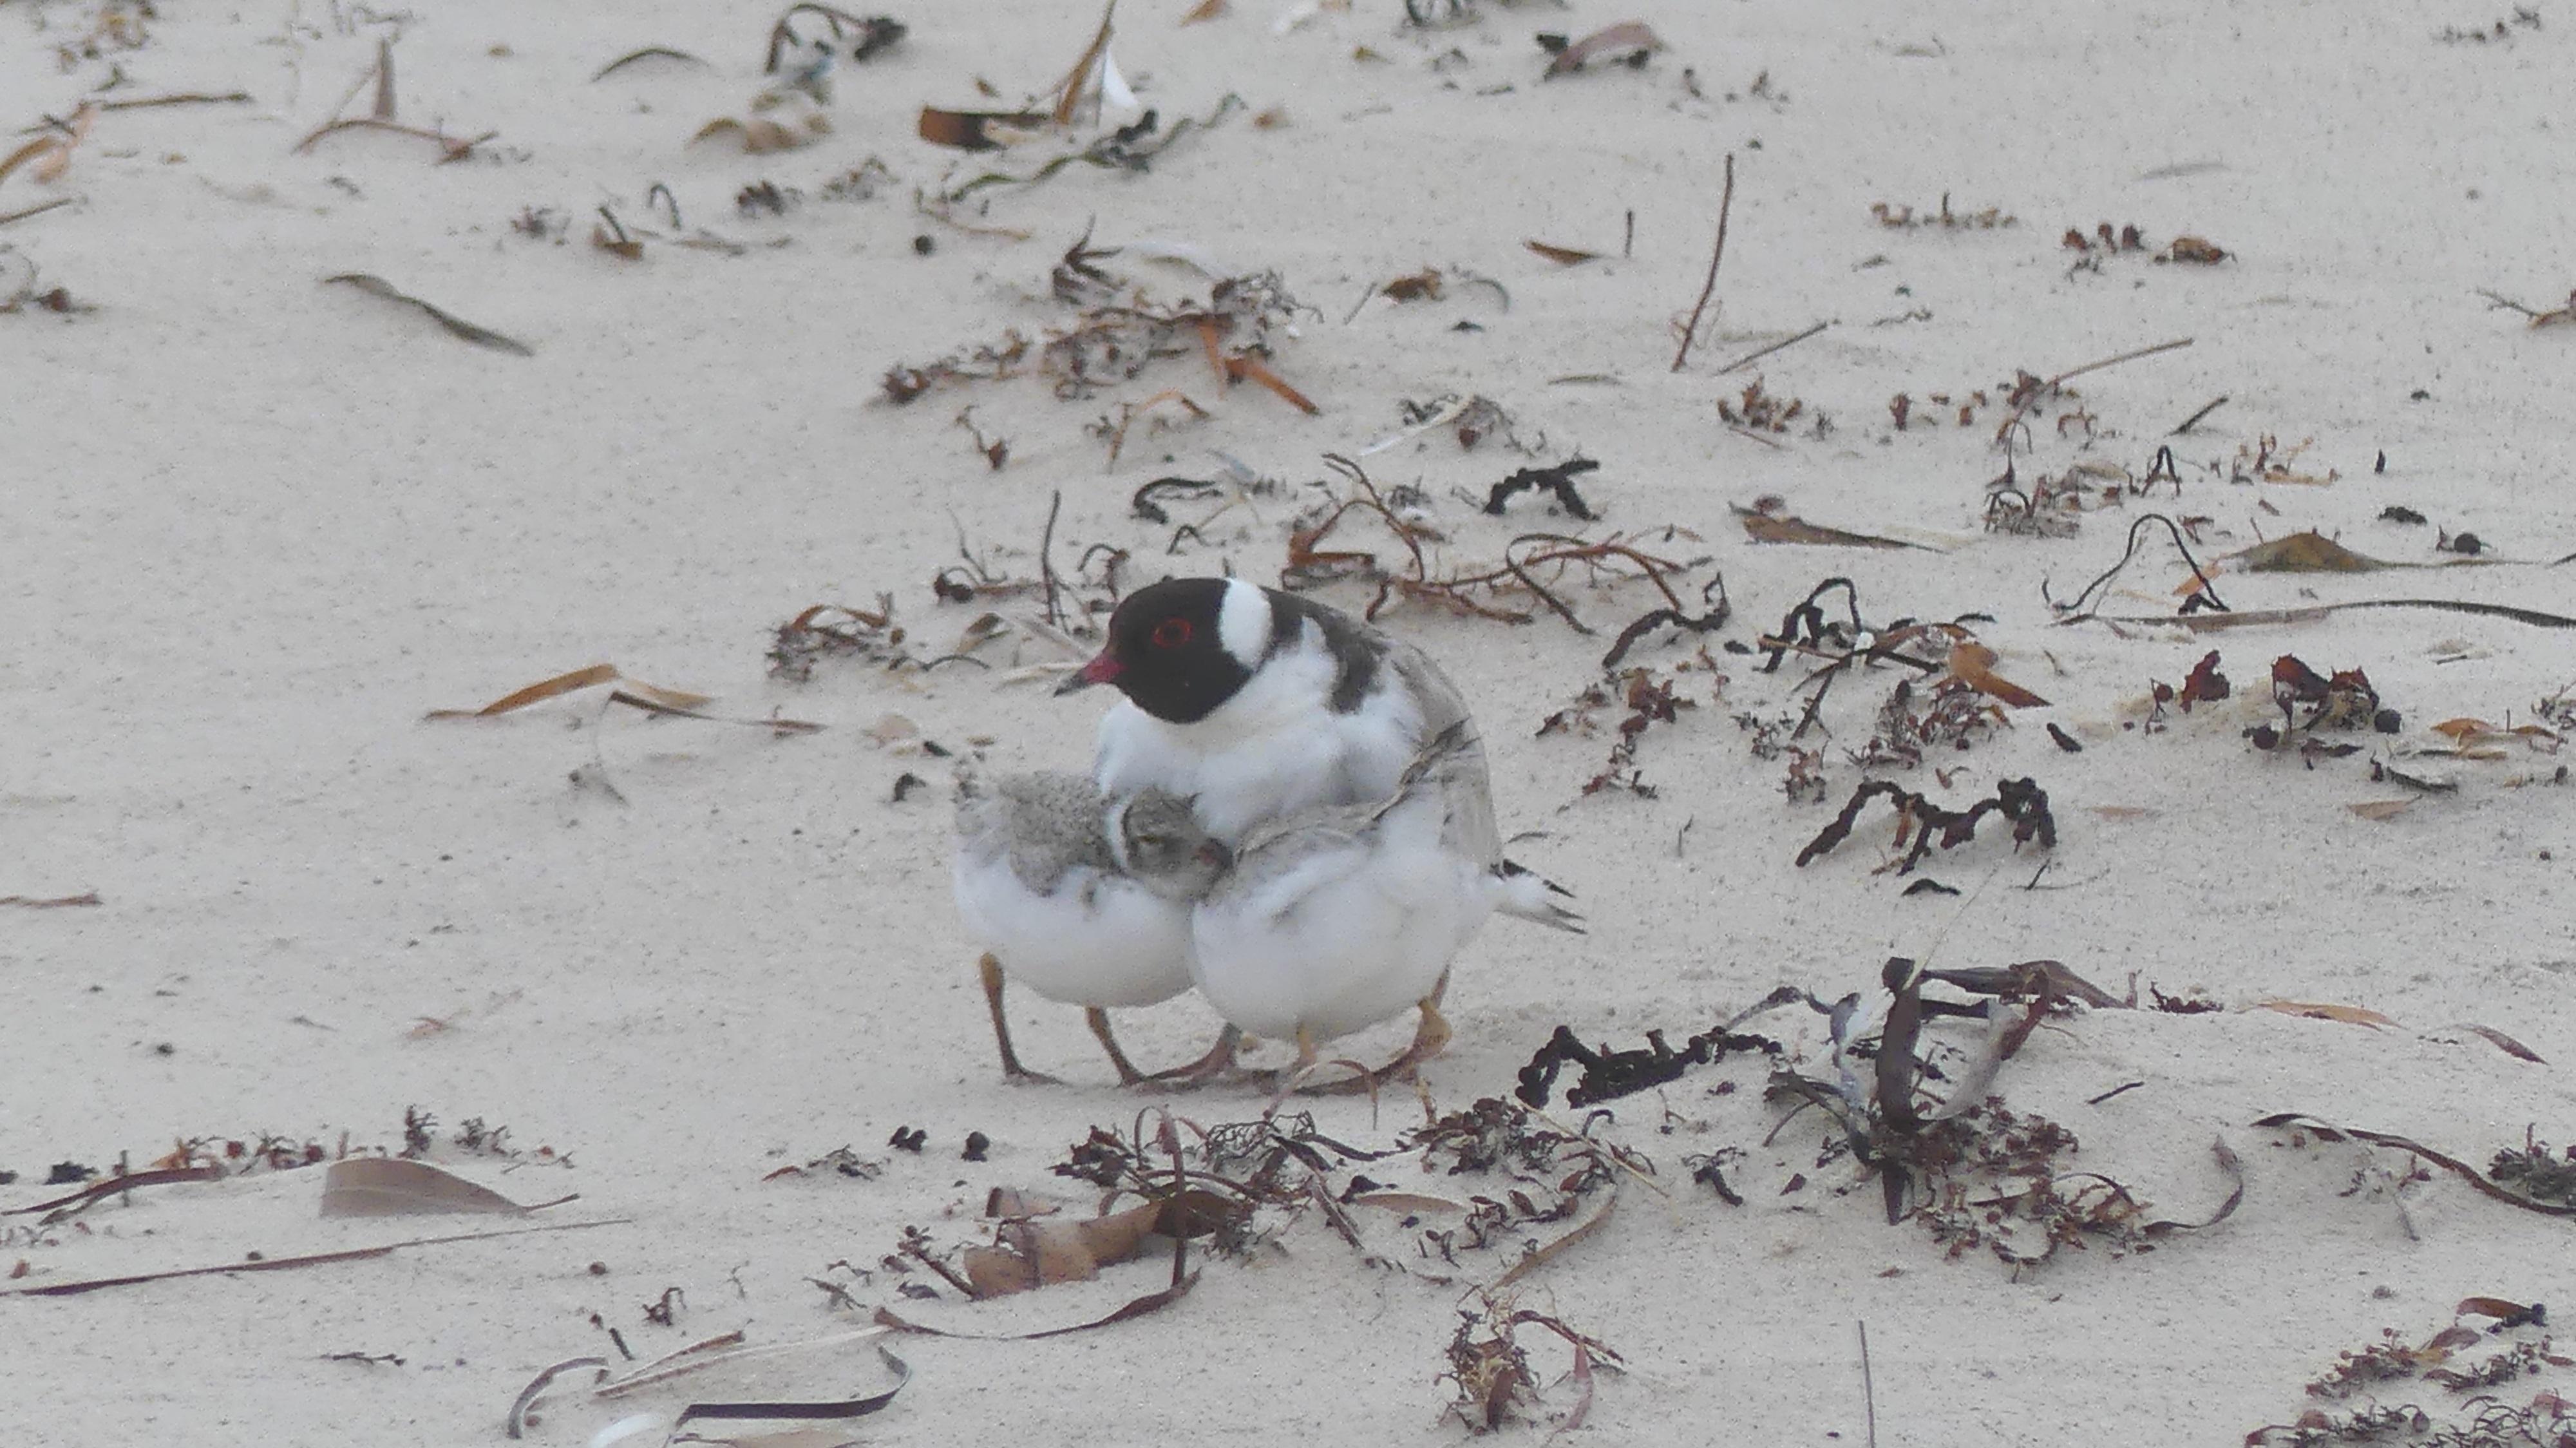 Hooded plover parent brooding chicks. Photo: Matt Endacott